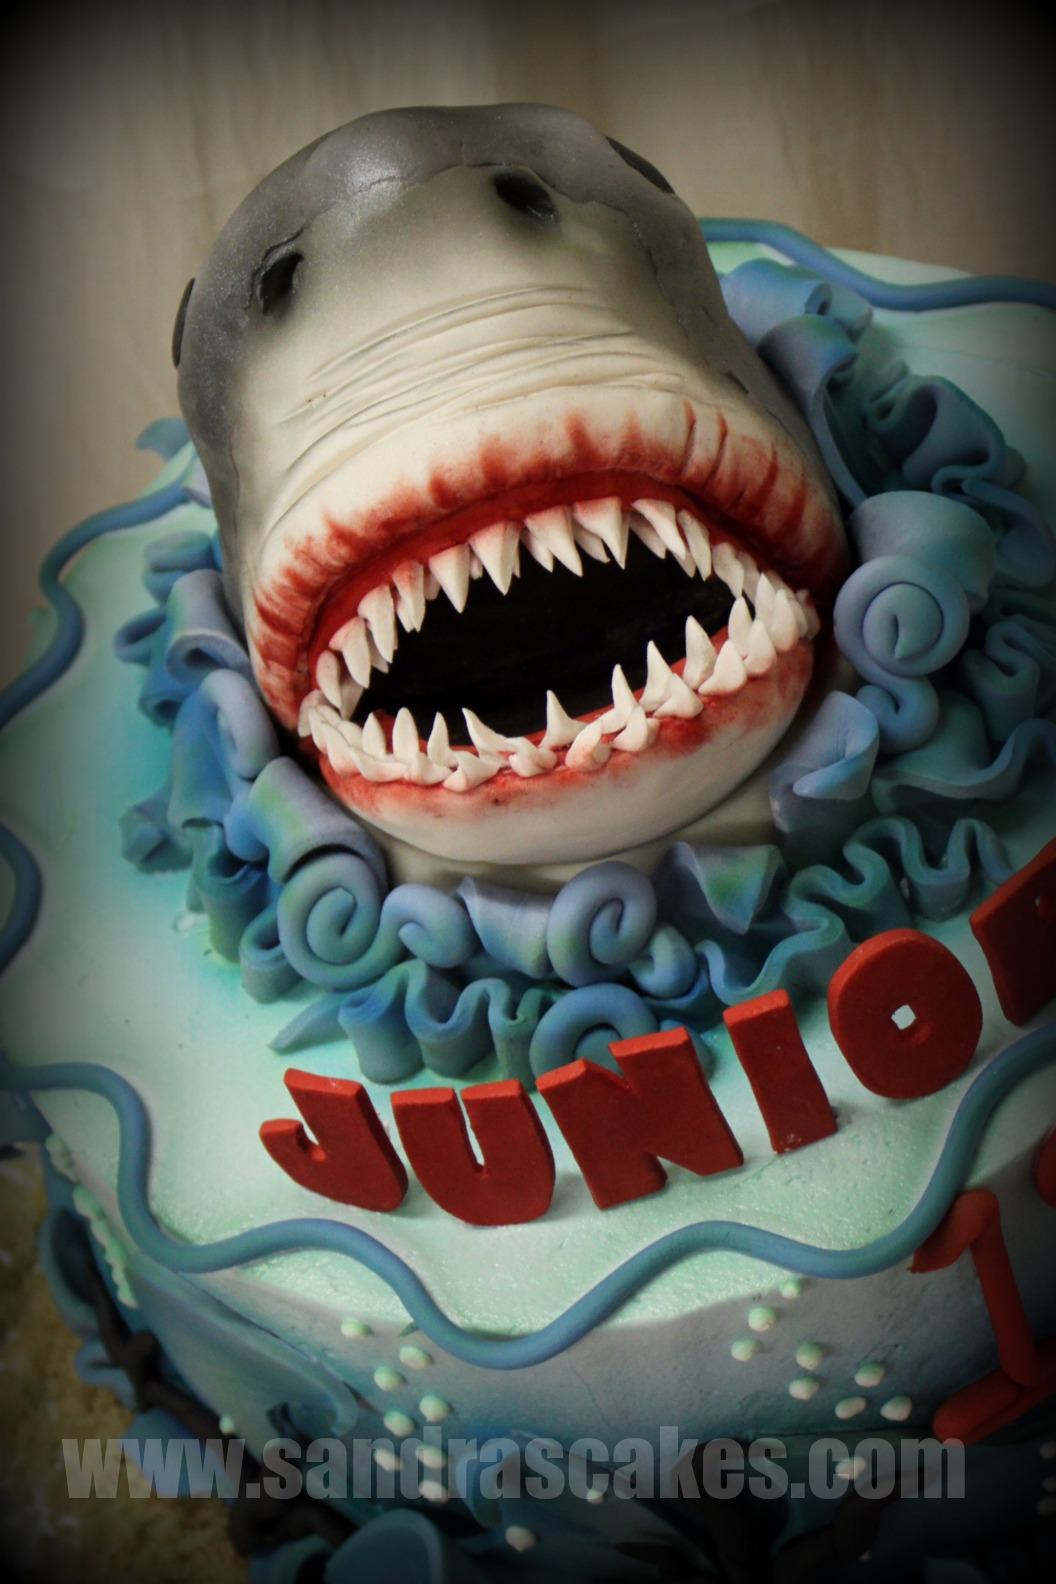 JAWS THEMED BIRTHDAY CAKE